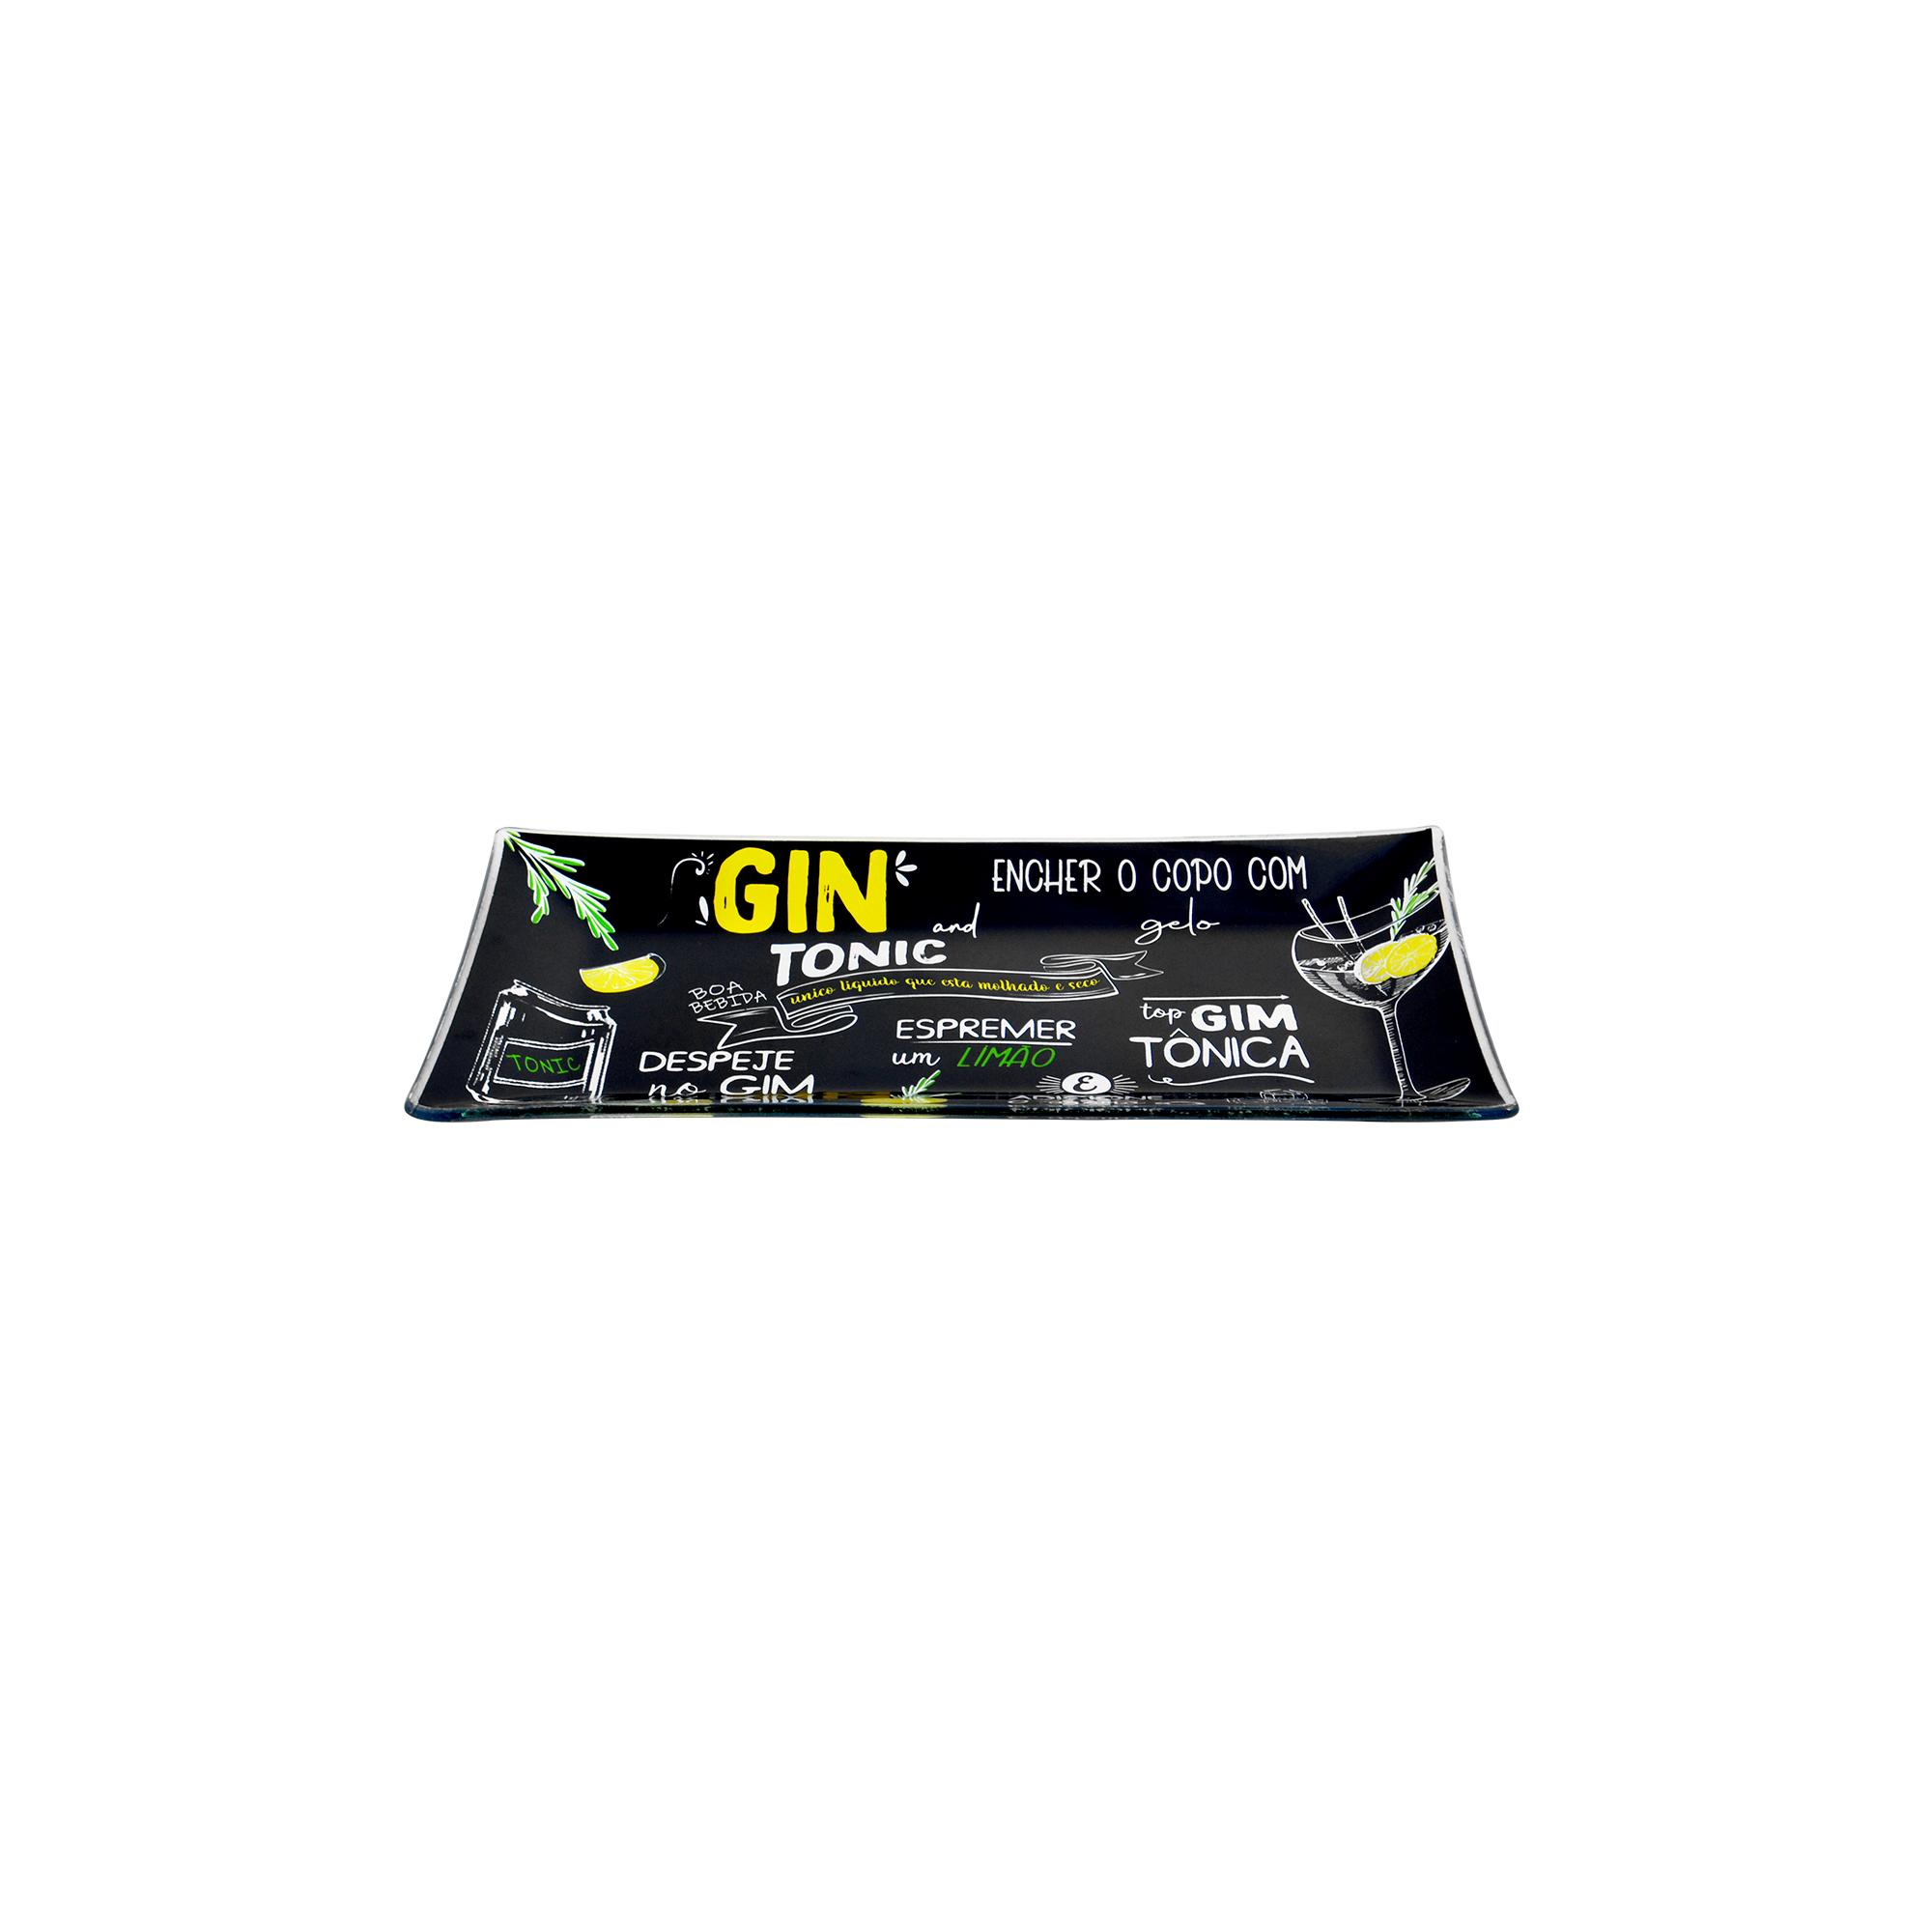 Travessa retangular média Gin